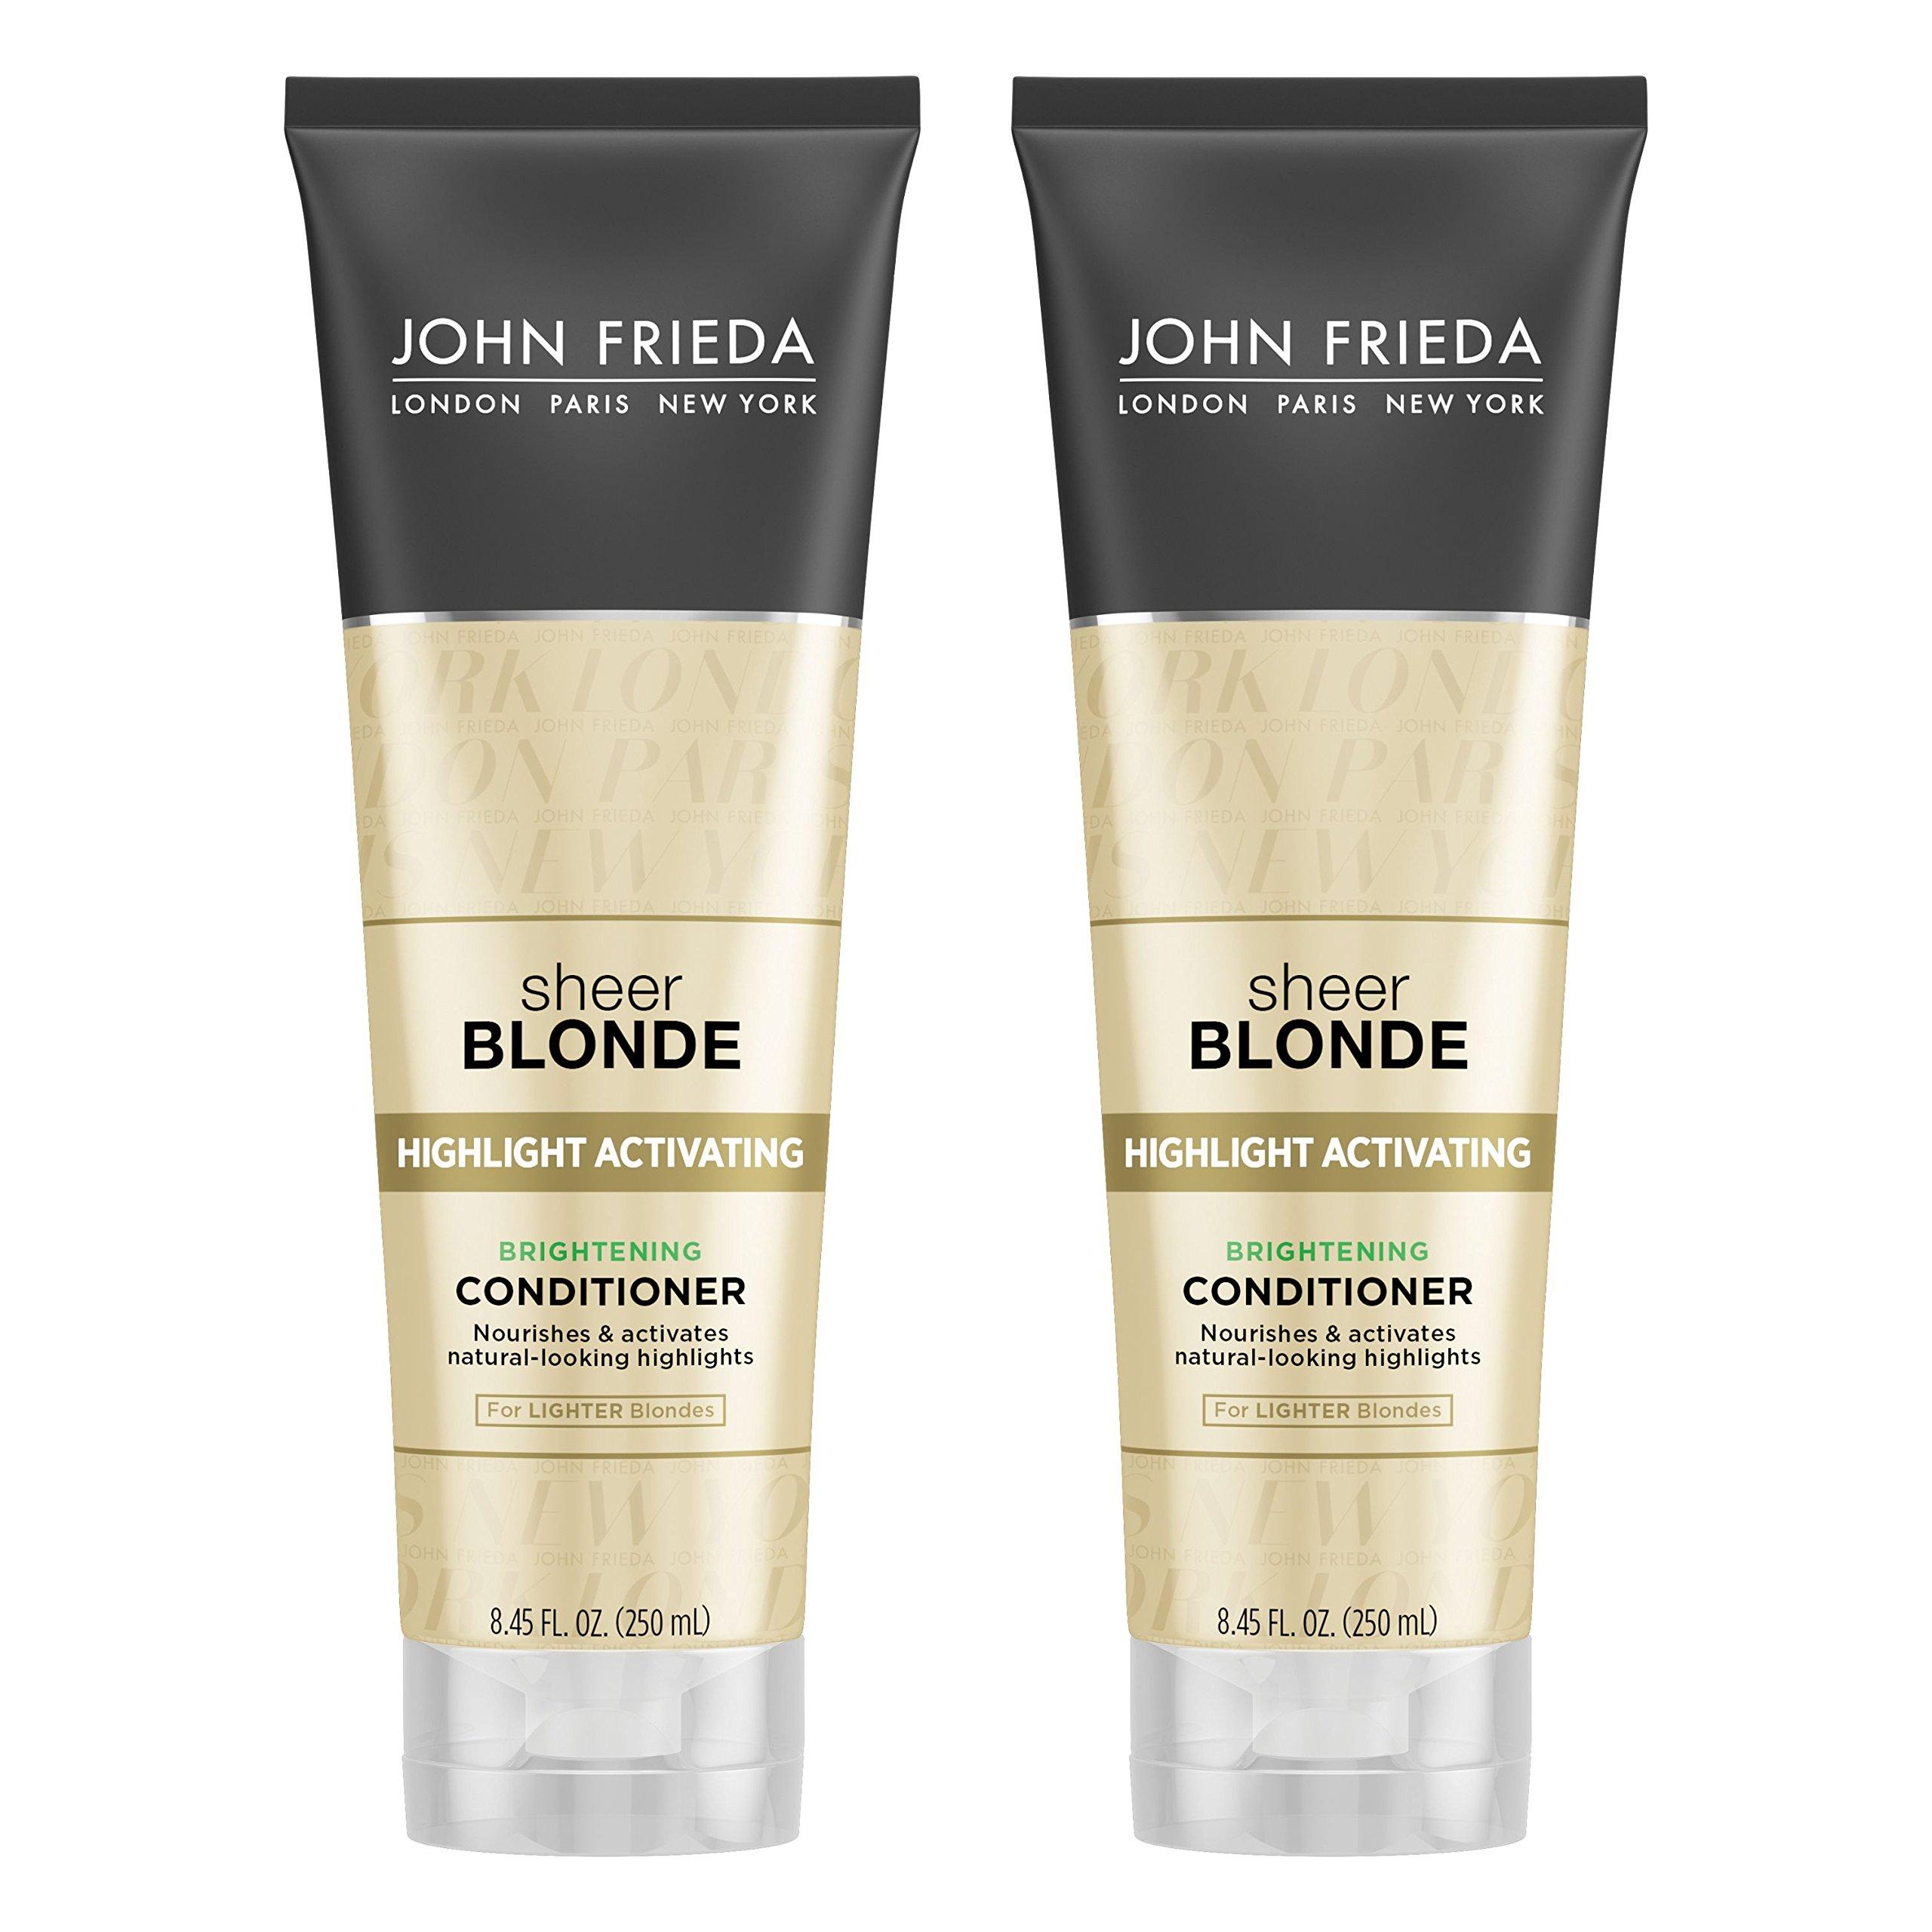 John Frieda Sheer Blonde Highlight Activating Brightening Conditioner for Lighter Blondes, 8.45 Ounces (Pack of 2)